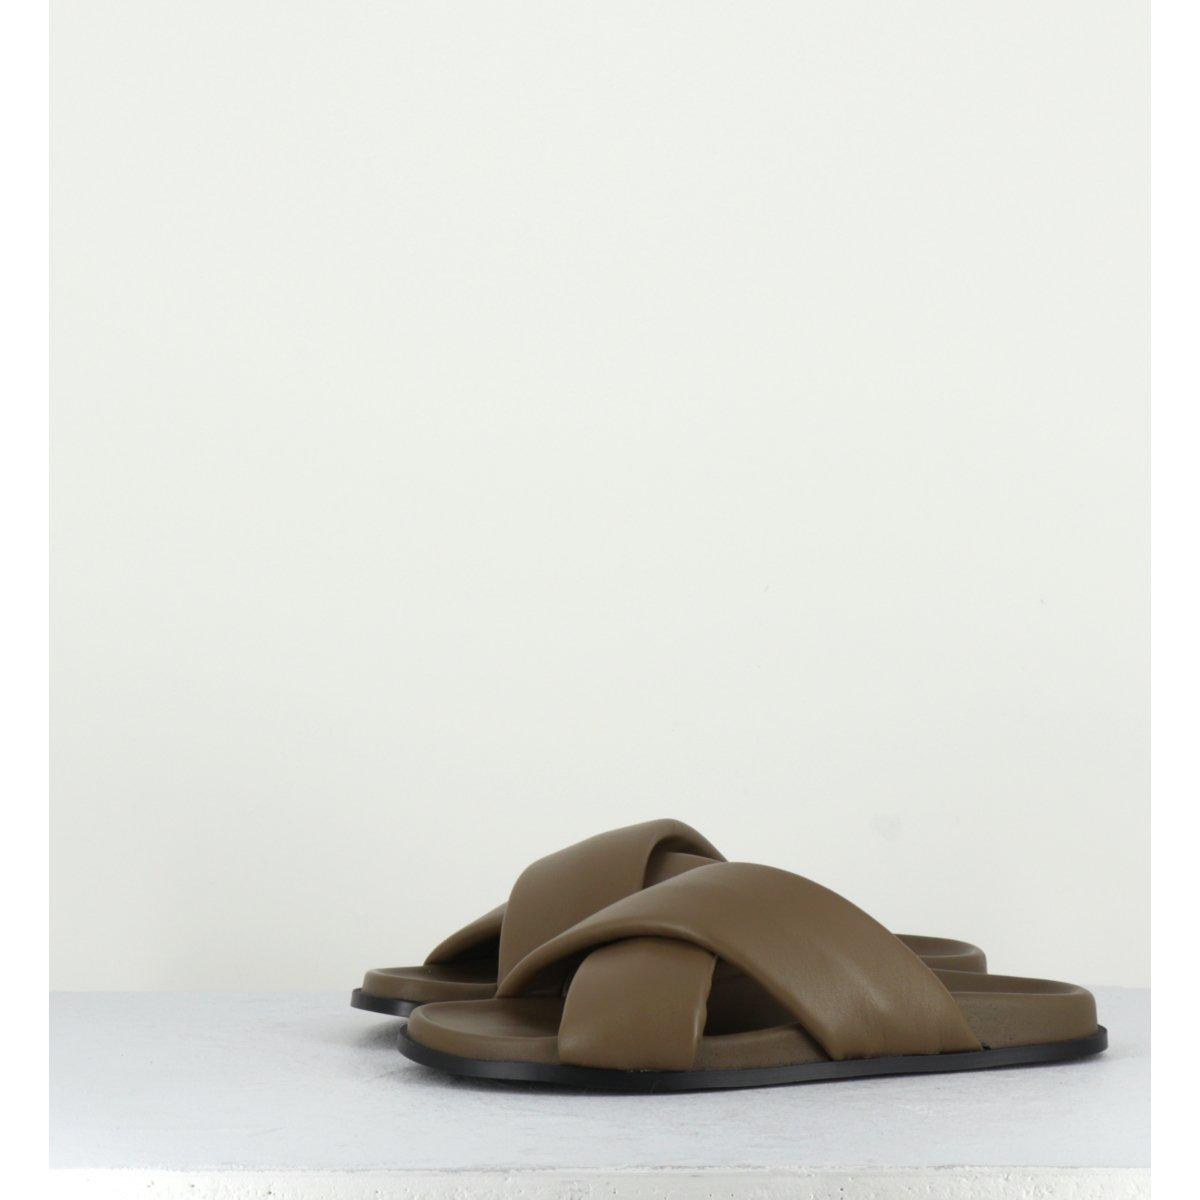 Sandales mules plates en cuir kaki Giulia Taddeucci - 4619247